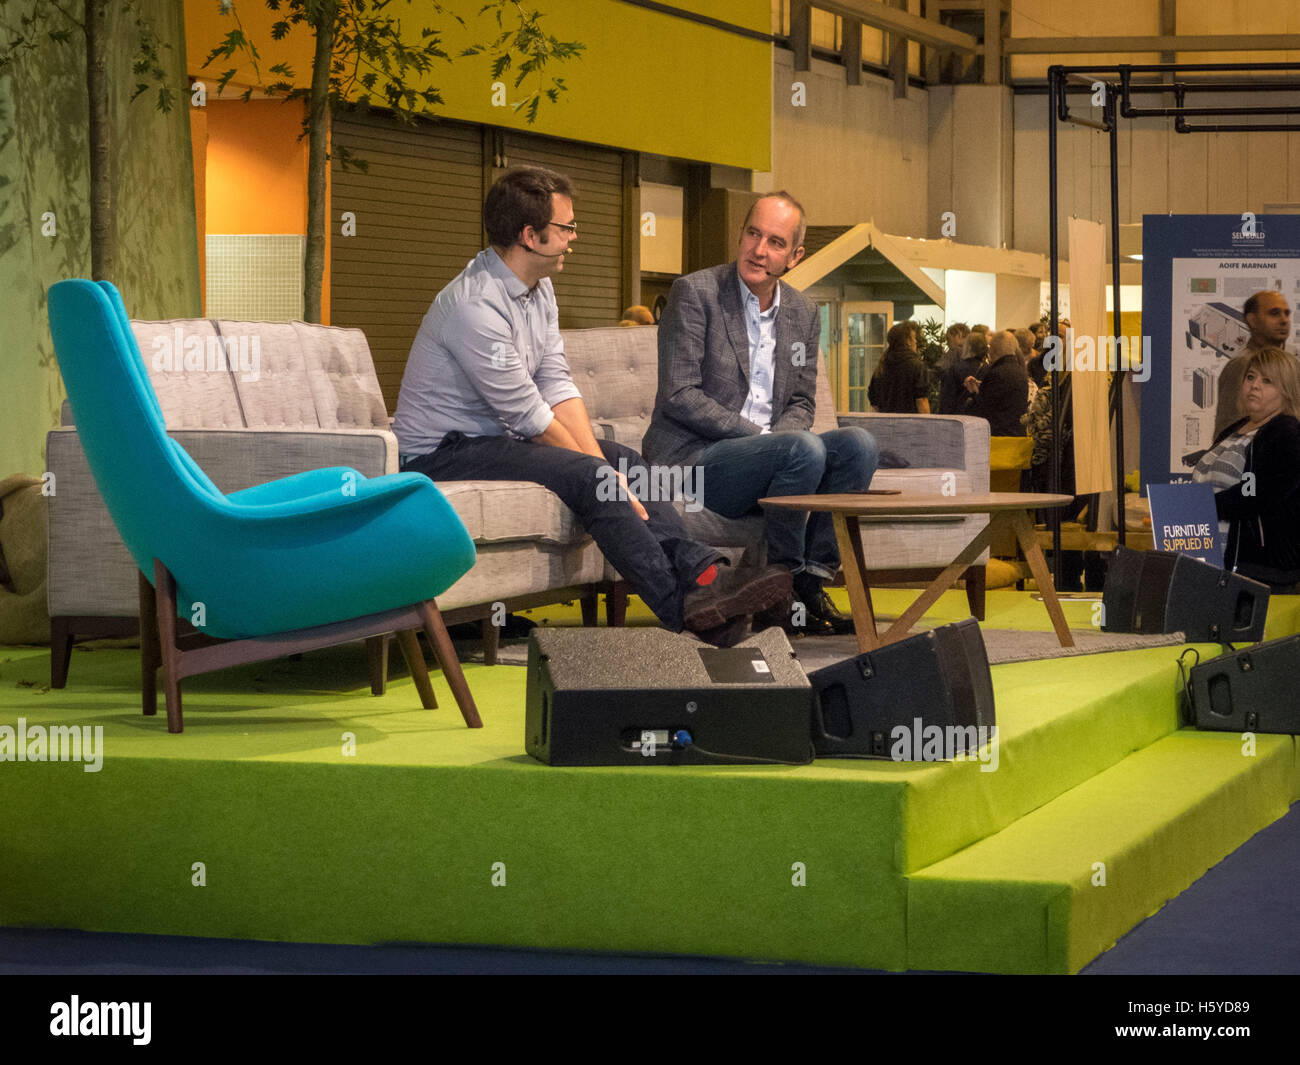 Birmingham, UK. 21st October, 2016. Kevin McCloud, presenter of Grand Designs, interviews architect Matt White in - Stock Image